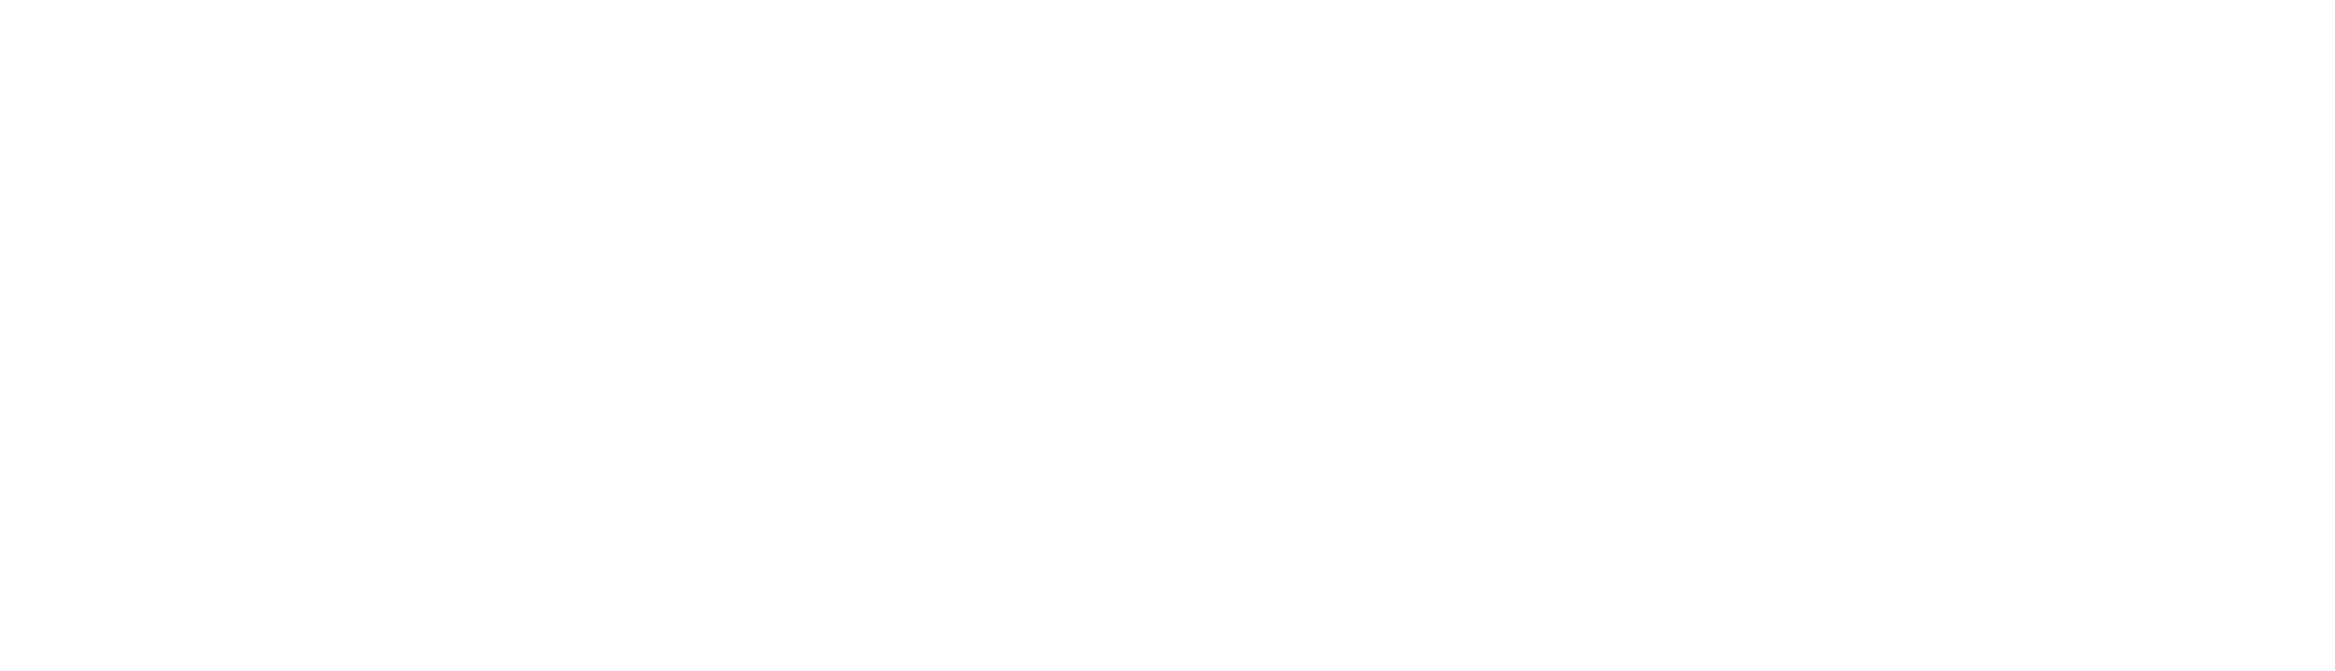 Siferd & Associates, LPA Logo